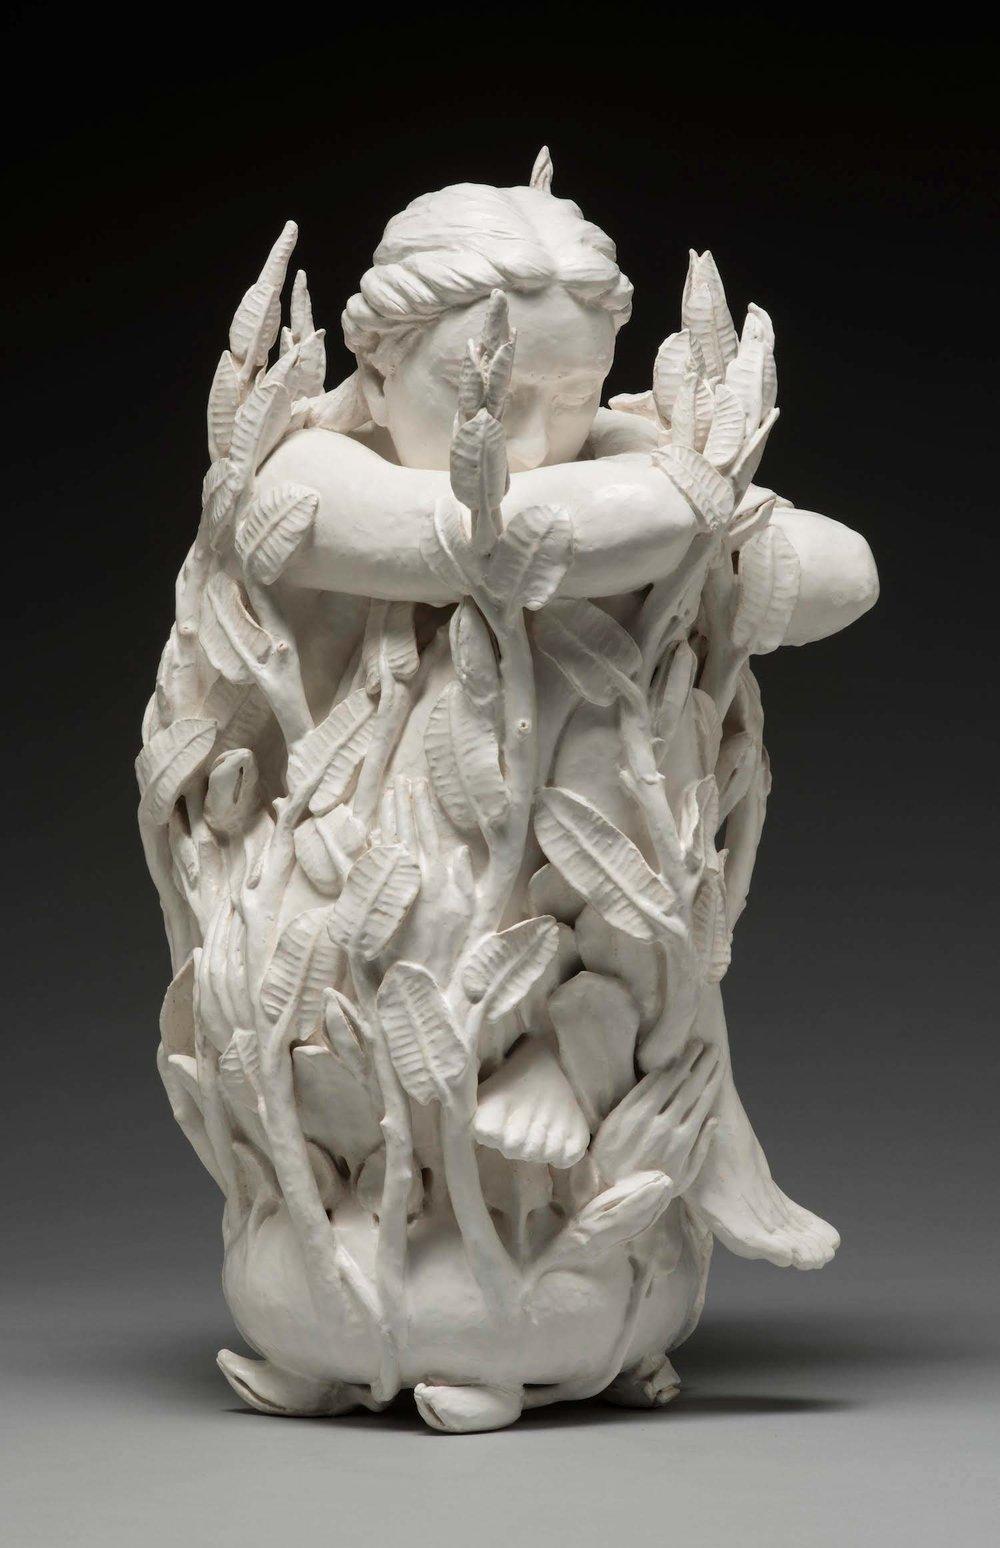 Surrealist Figure Ceramic Sculptures By Adrian Arleo 5